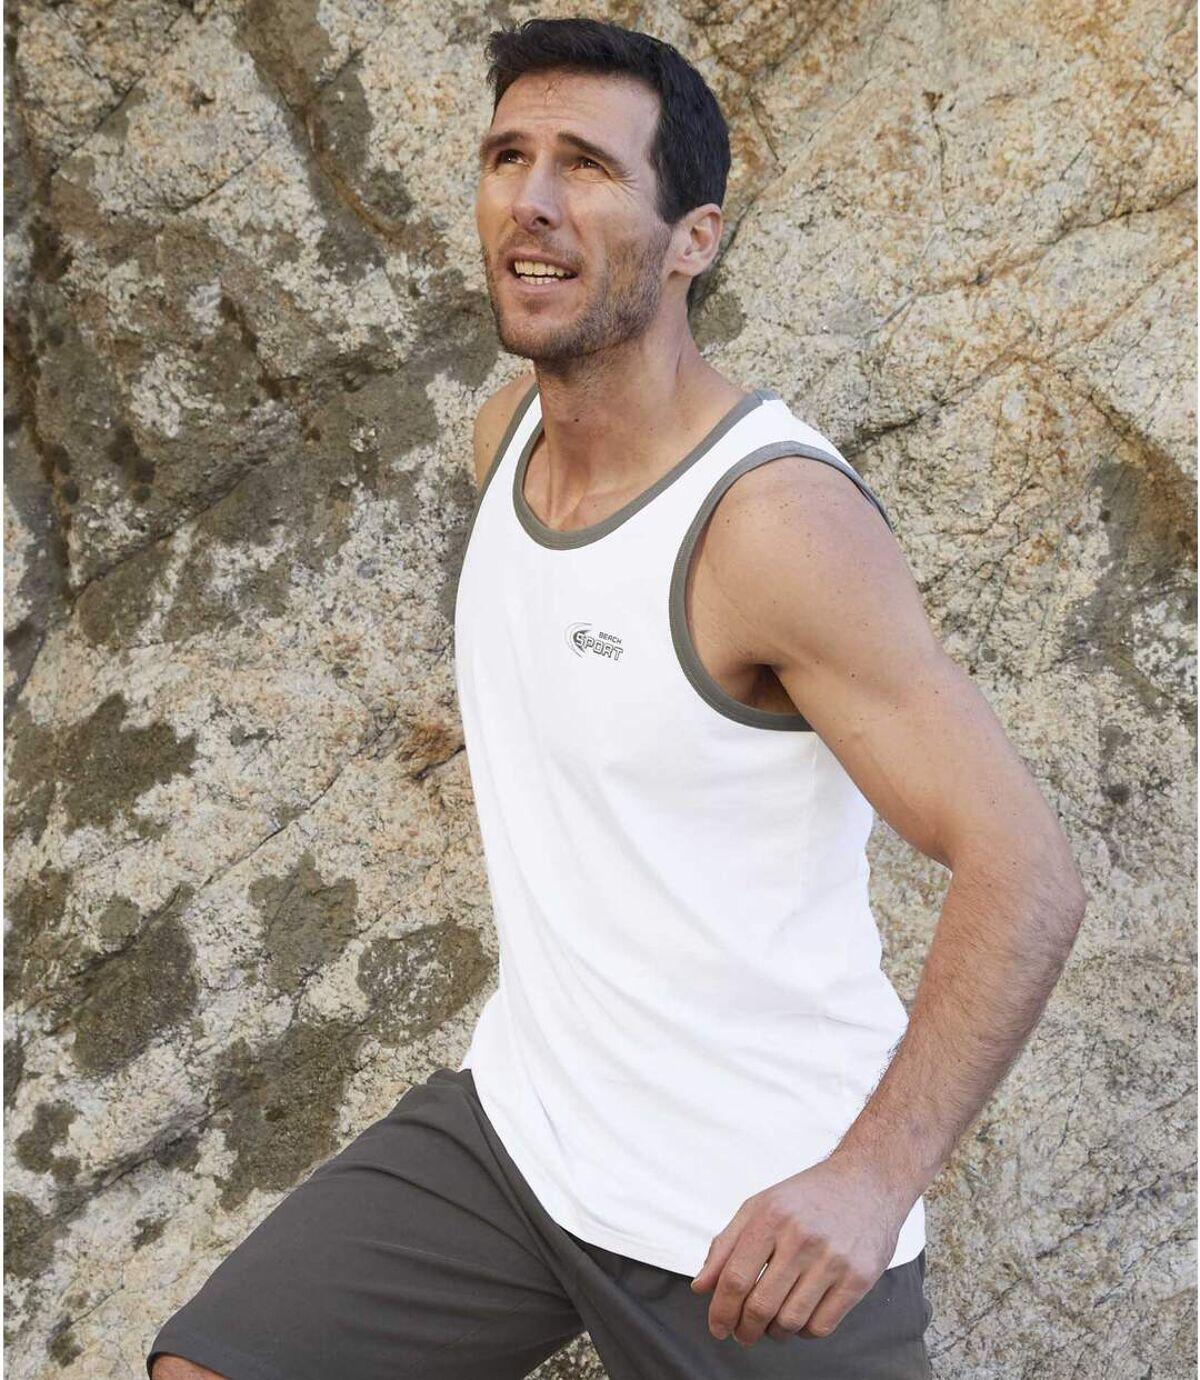 Zestaw 3 podkoszulków Beach Sport Atlas For Men